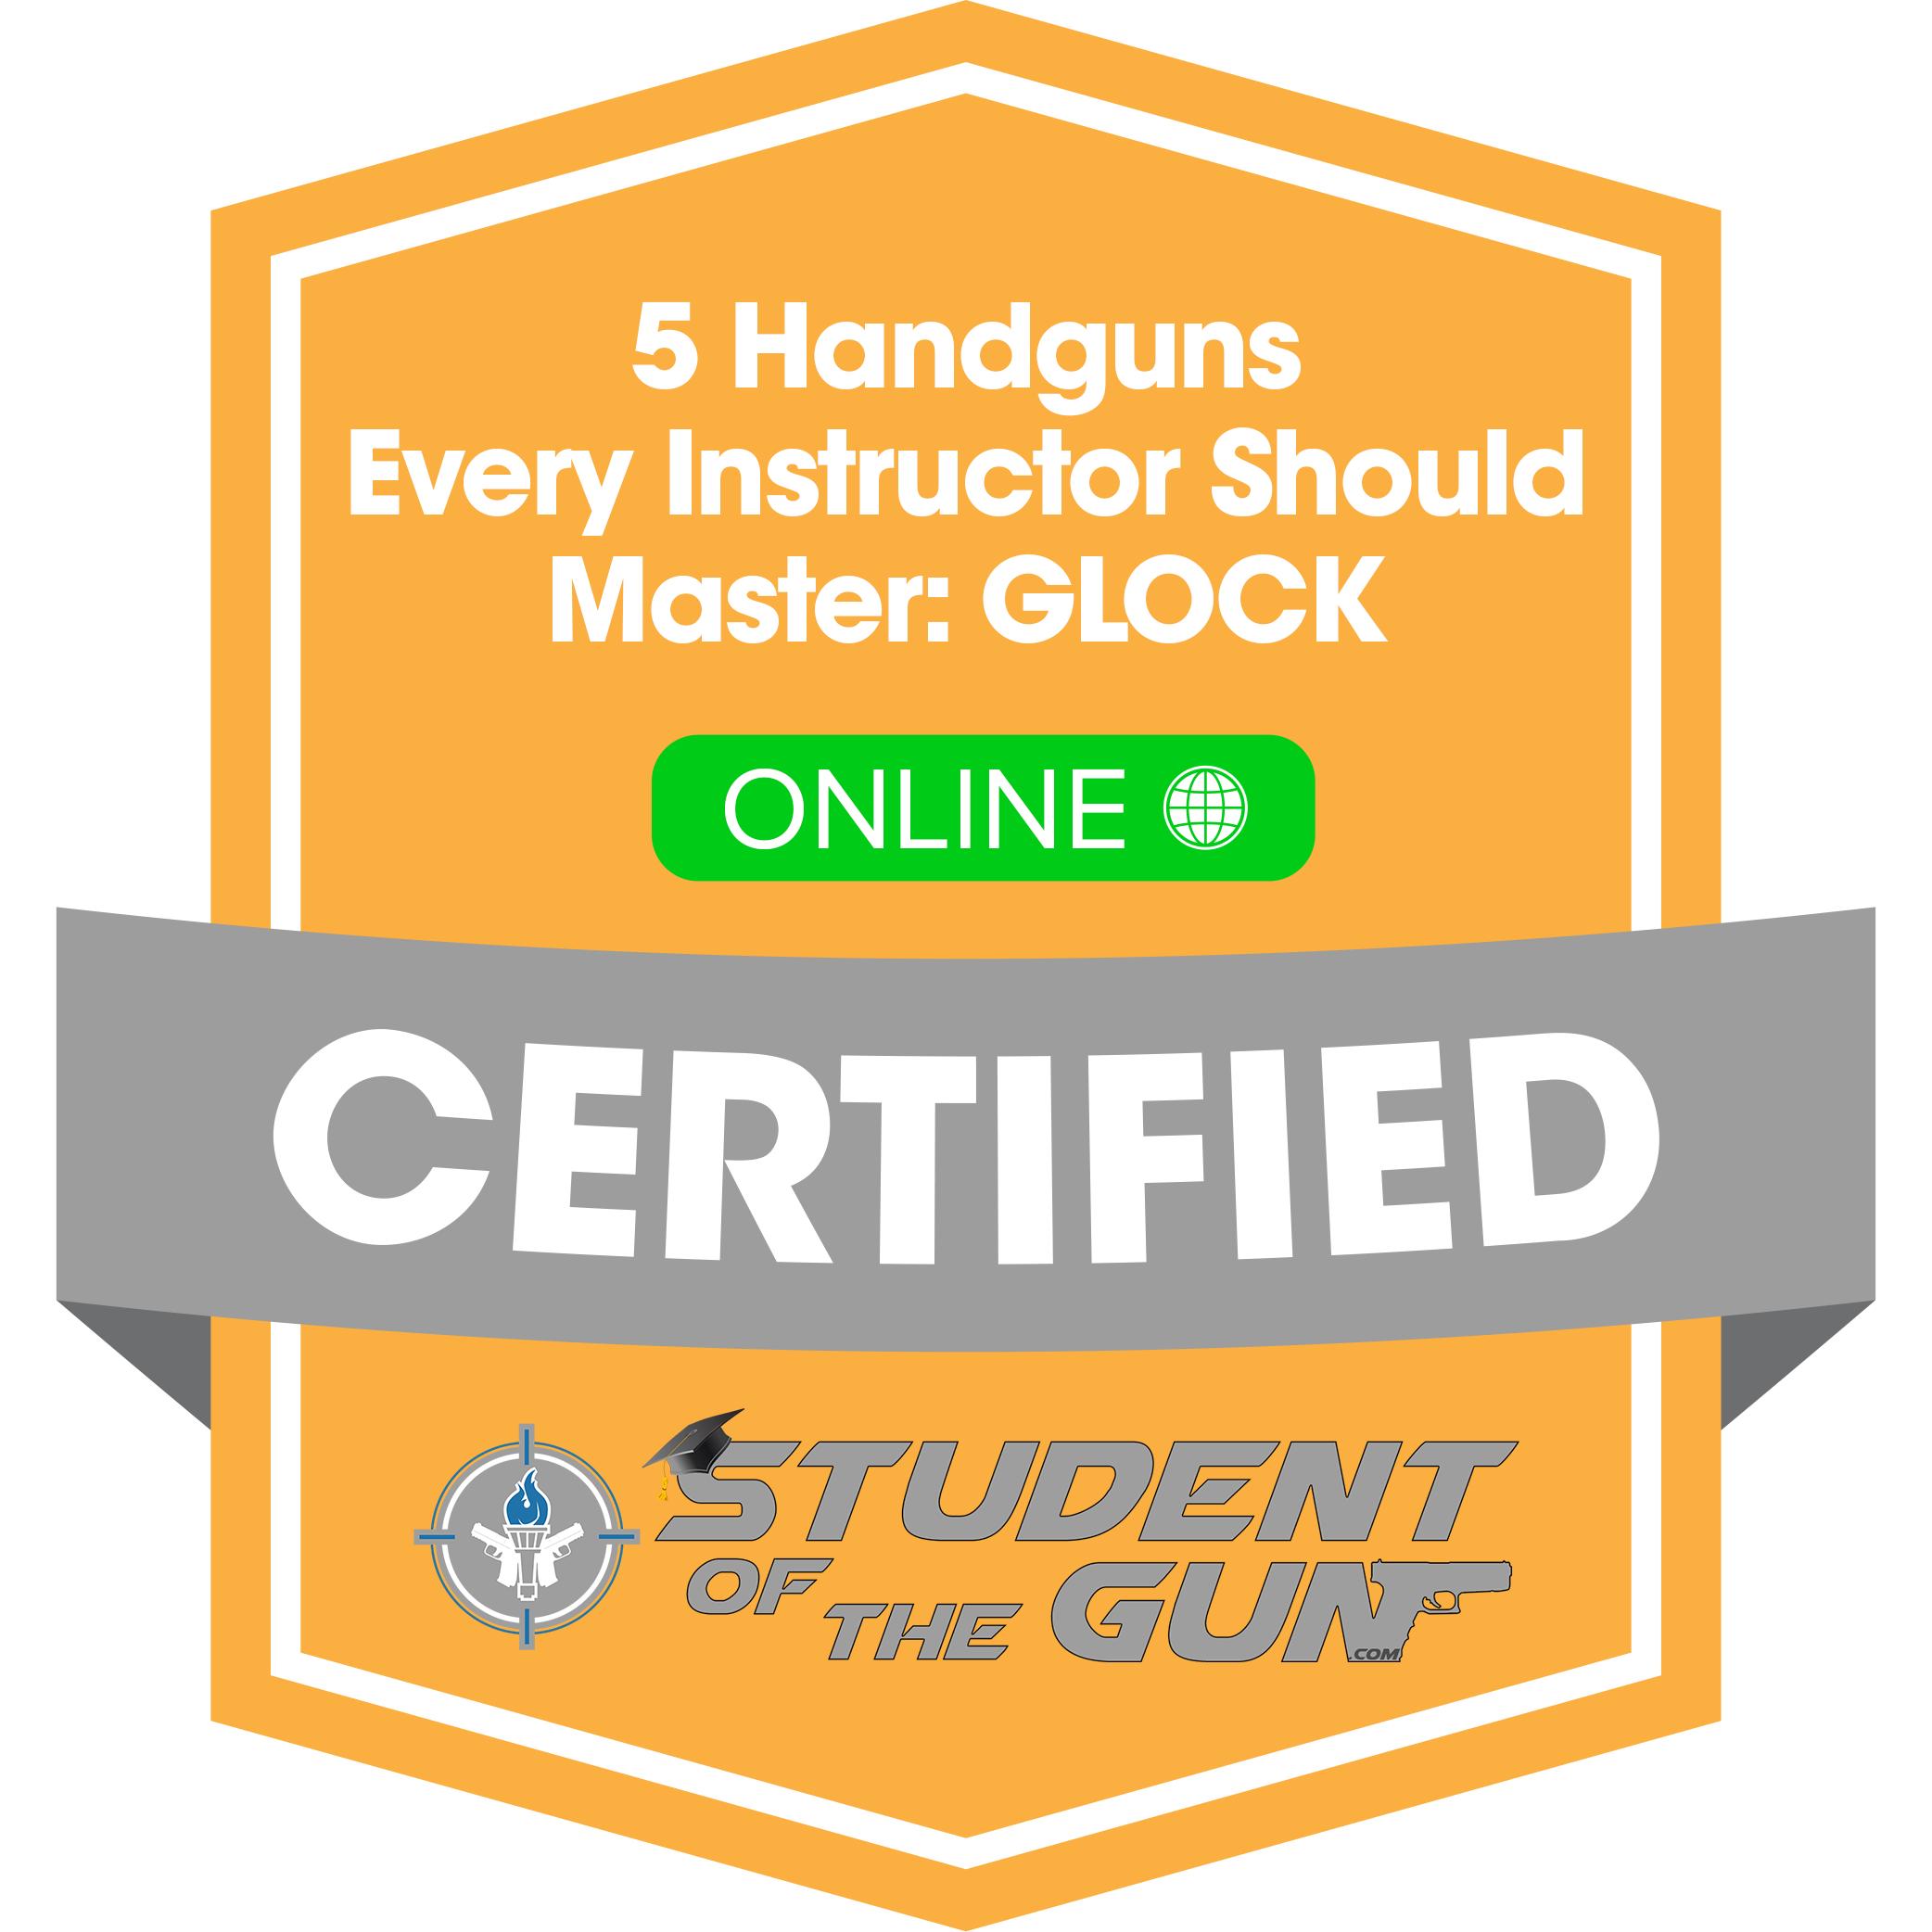 [Badge] 5 Handguns Every Instructor Should Master: GLOCK